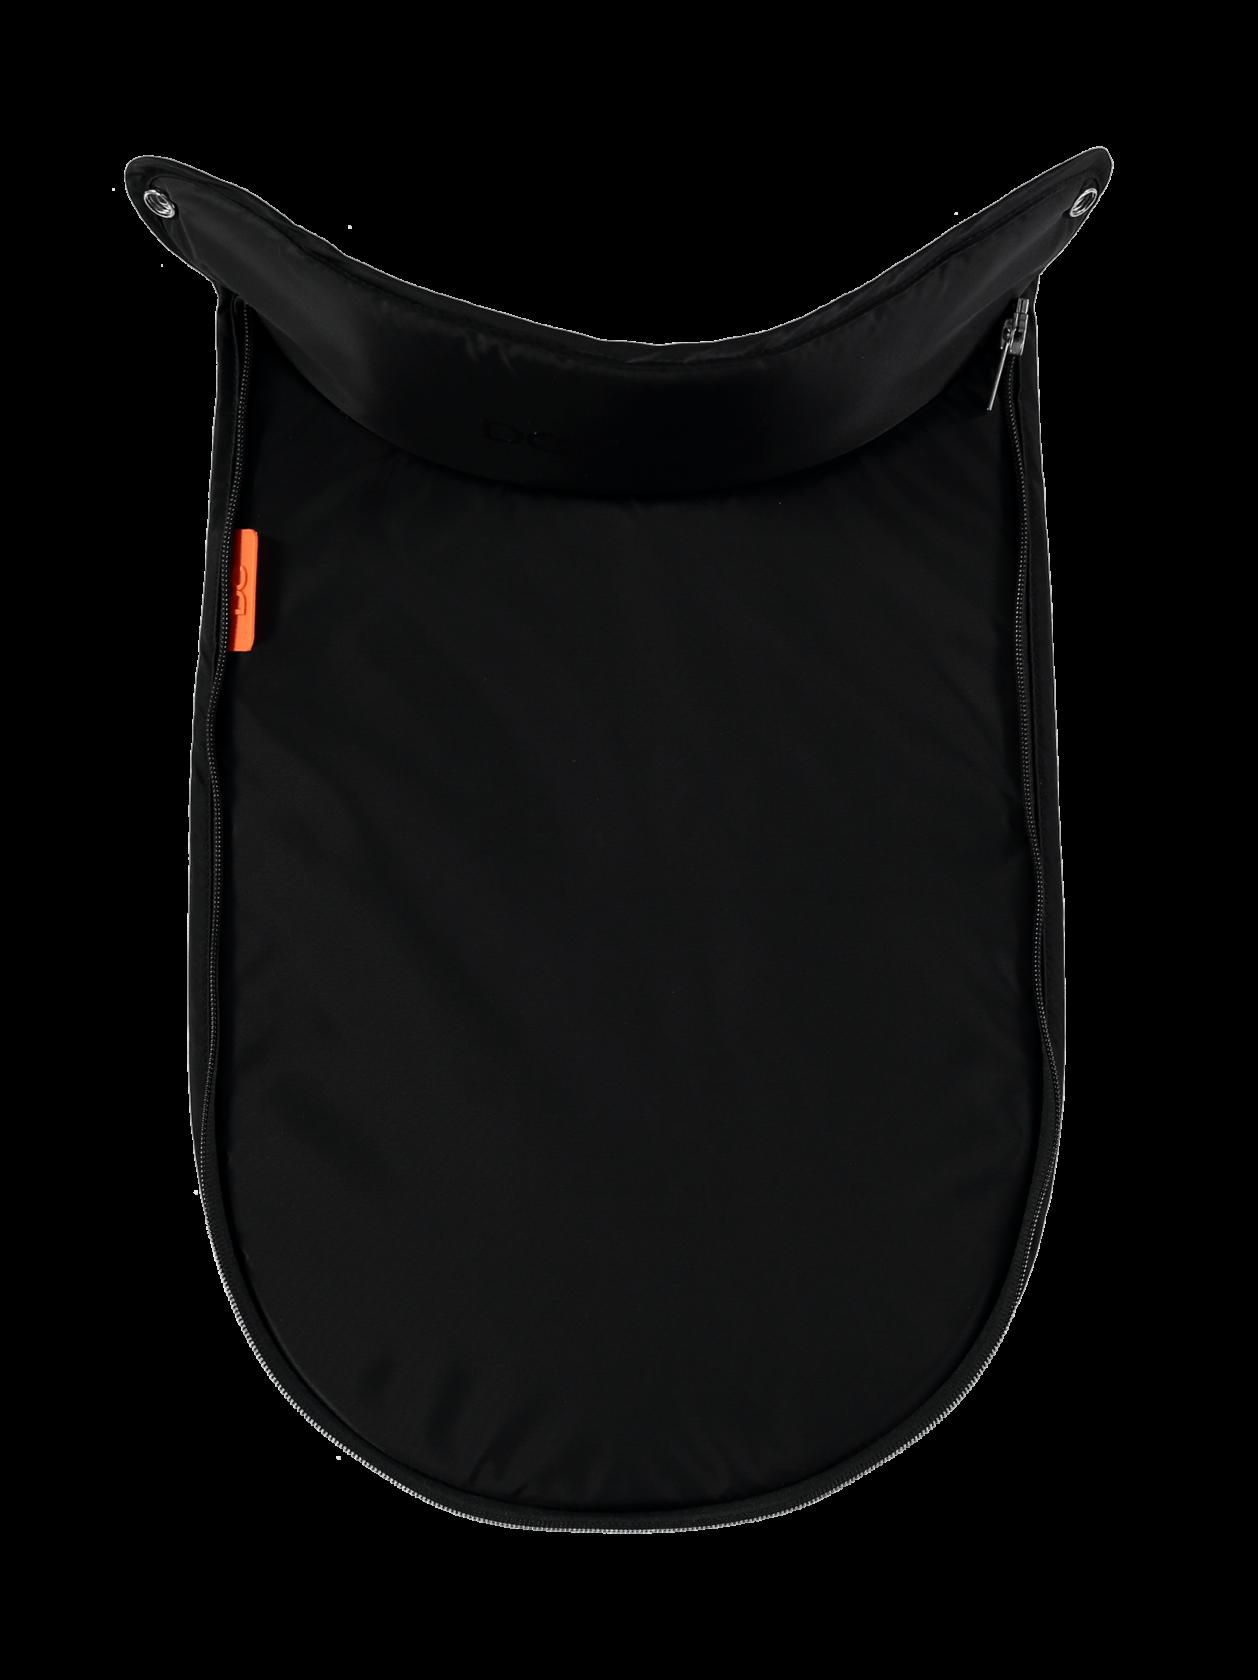 Peach DC Main Carrycot Apron - Black